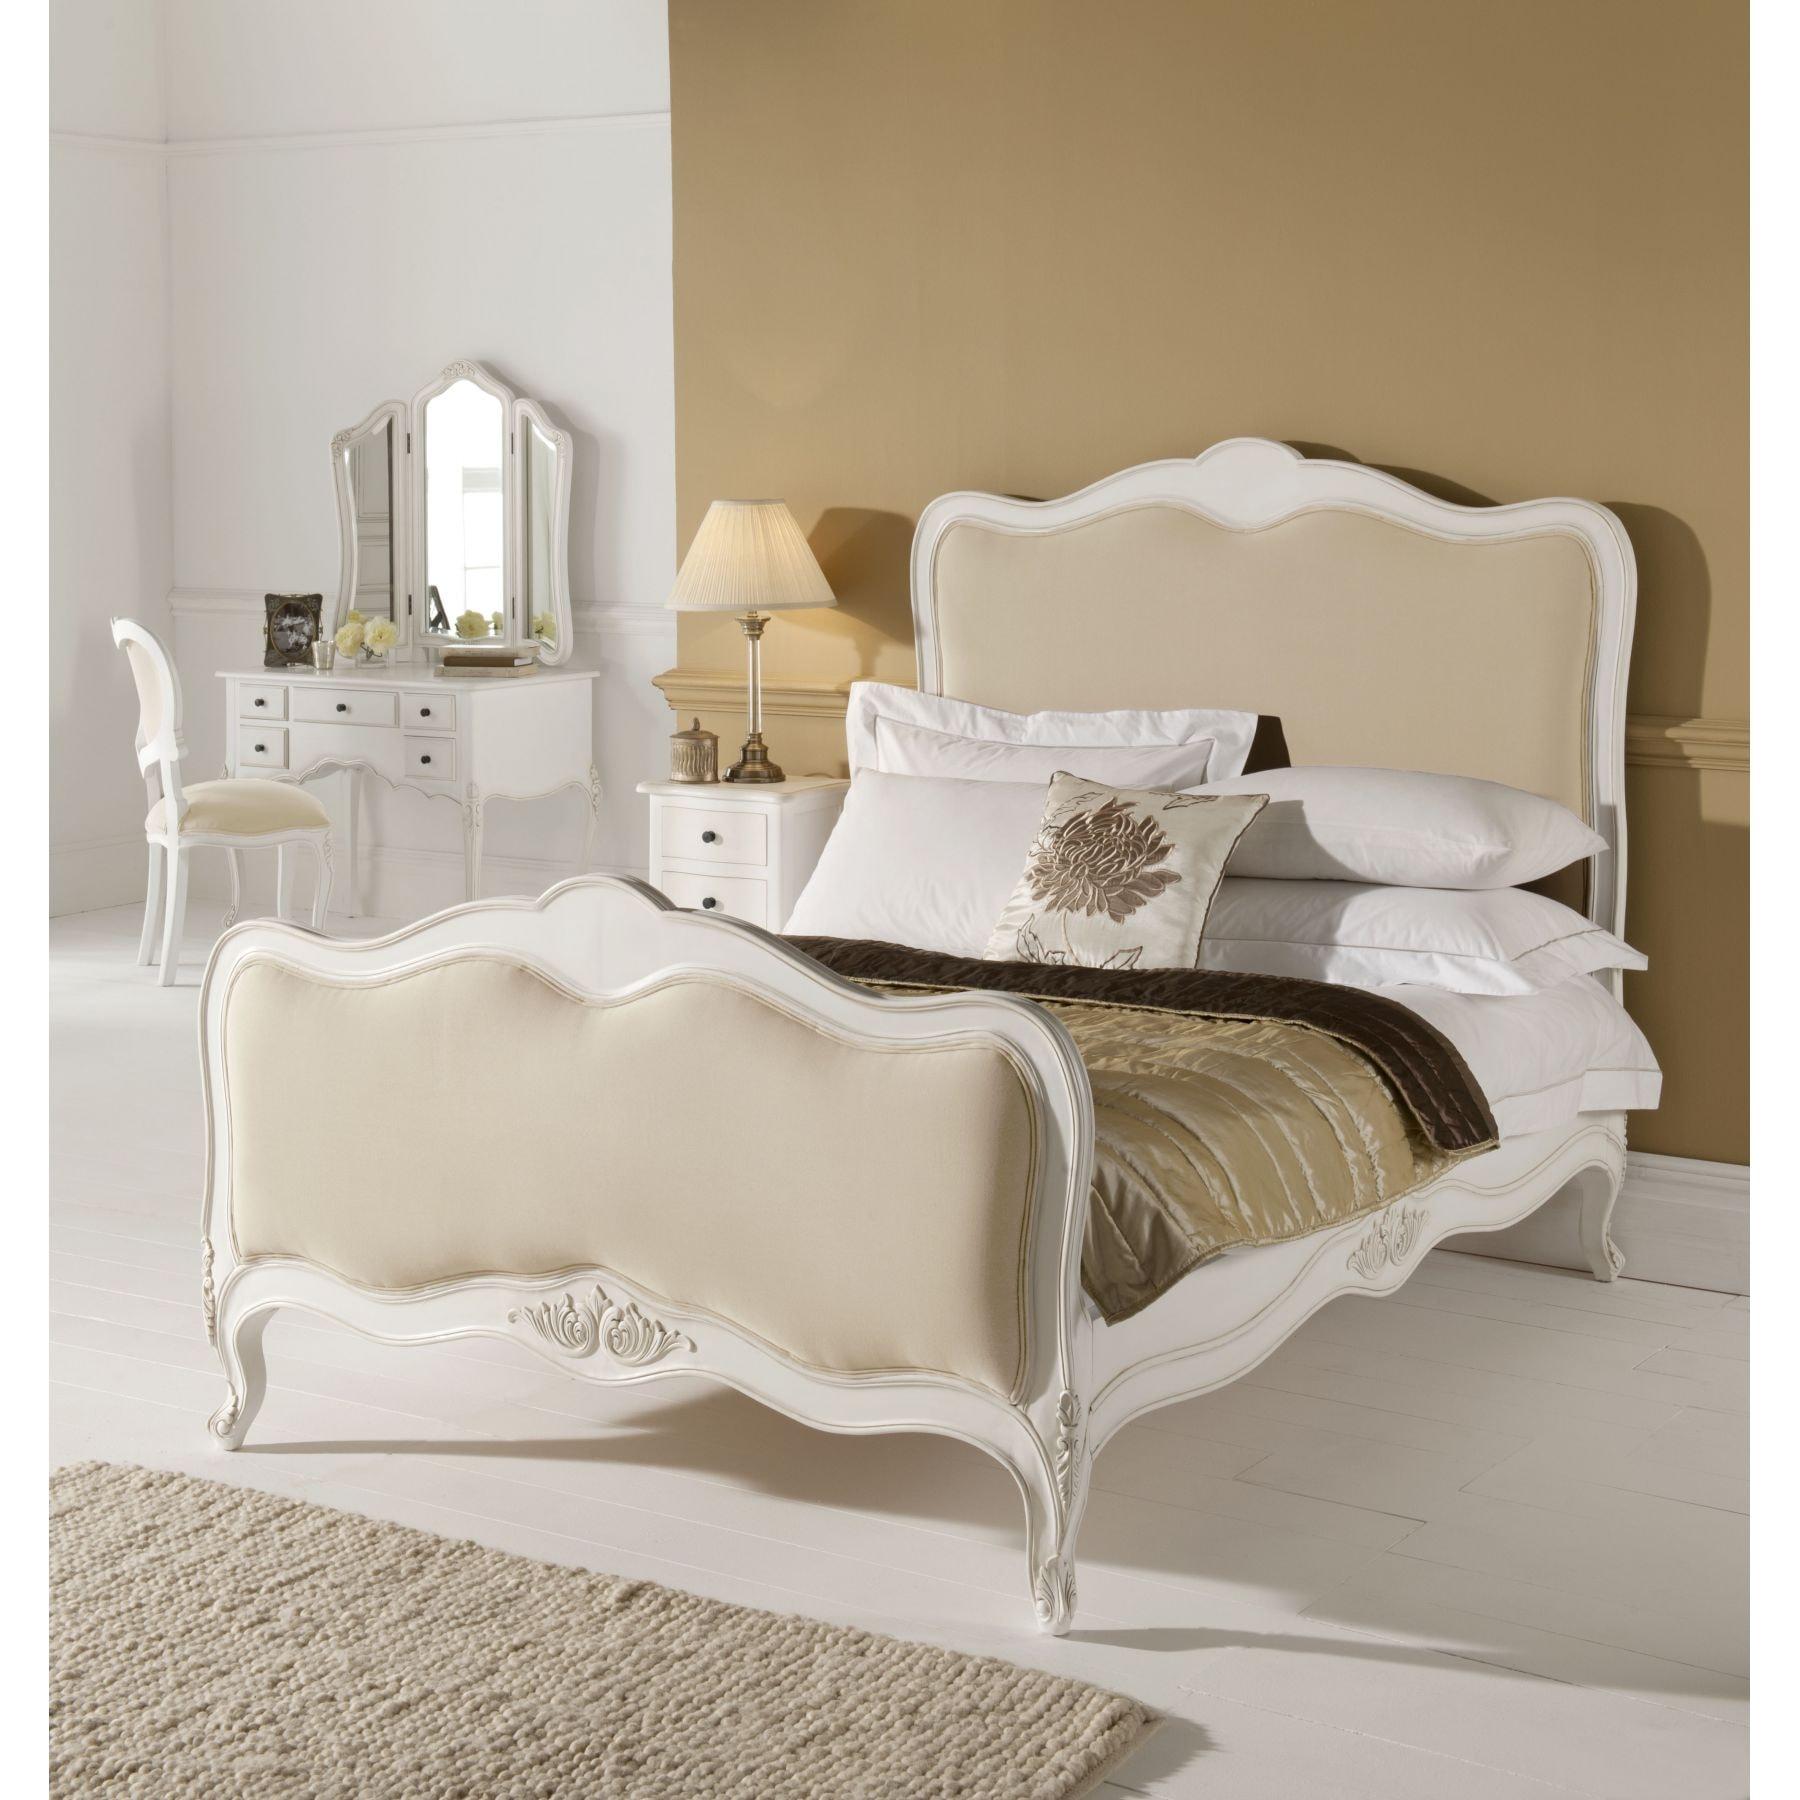 Paris French Bed & Mattress Bundle